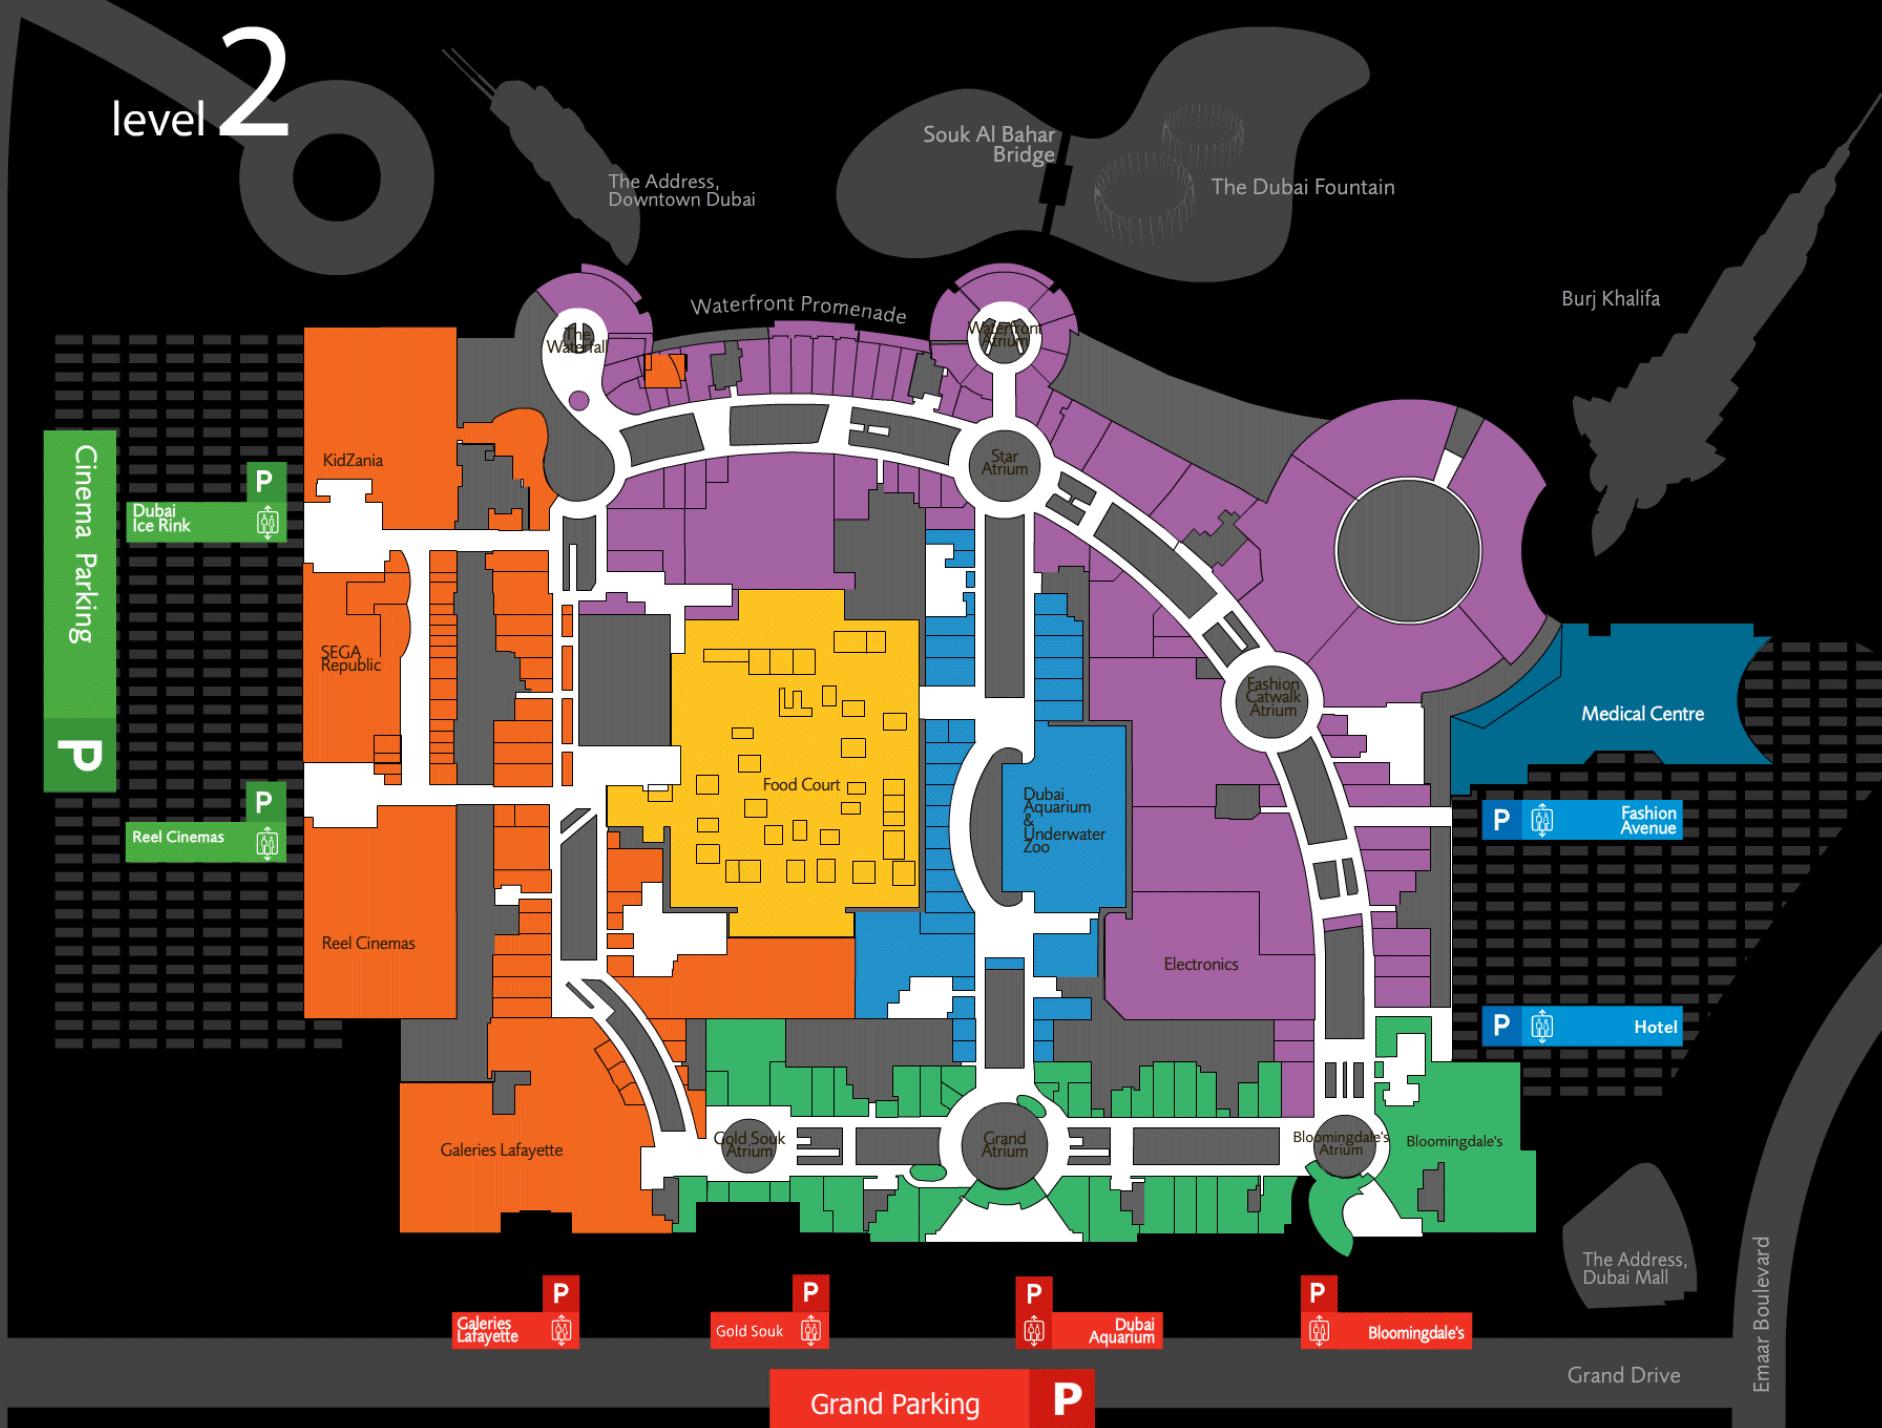 карта дубай молла на русском